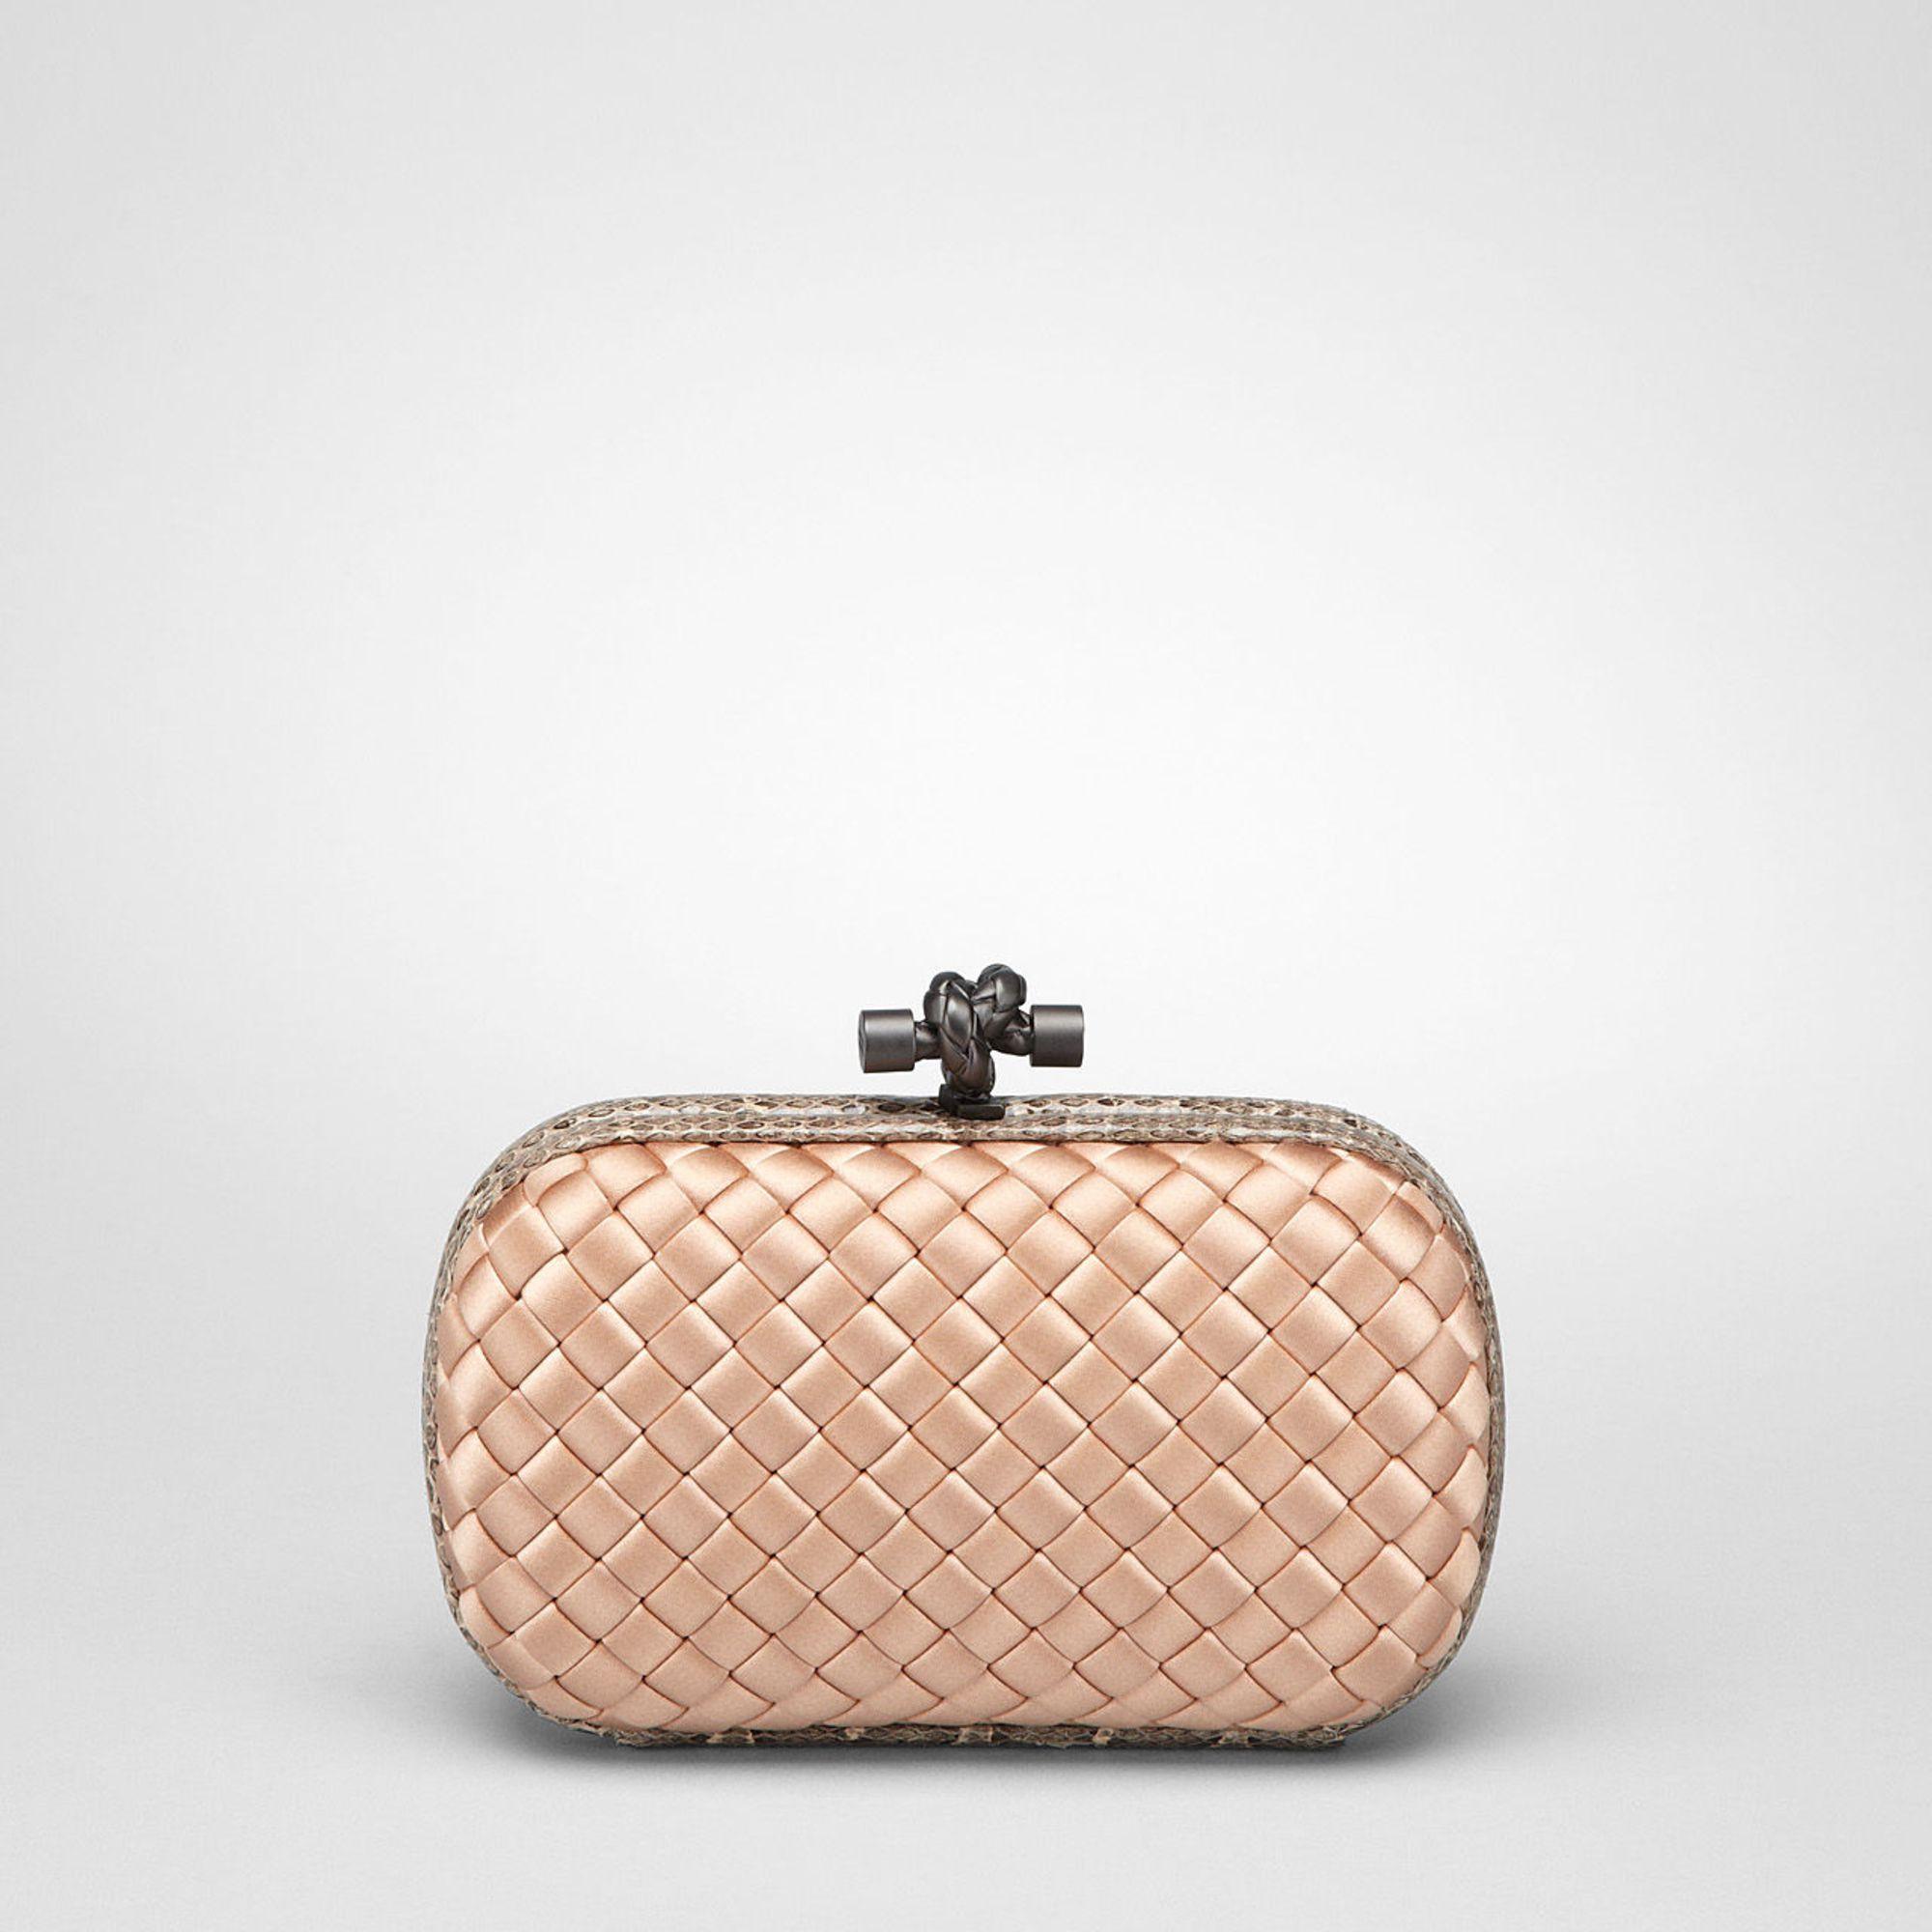 bottega veneta satin box clutch bag in gold nude lyst. Black Bedroom Furniture Sets. Home Design Ideas